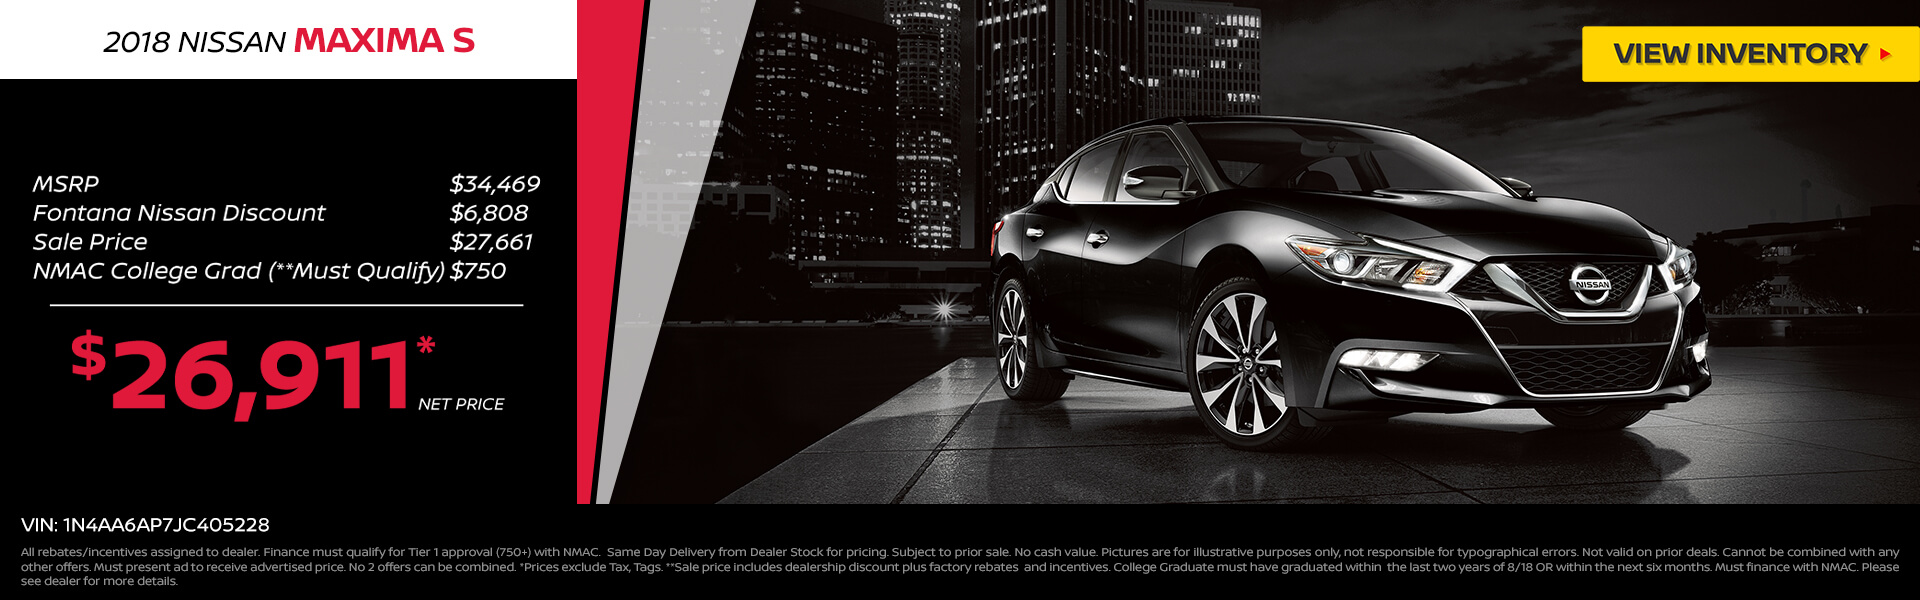 Nissan Maxima $26,991 Purchase